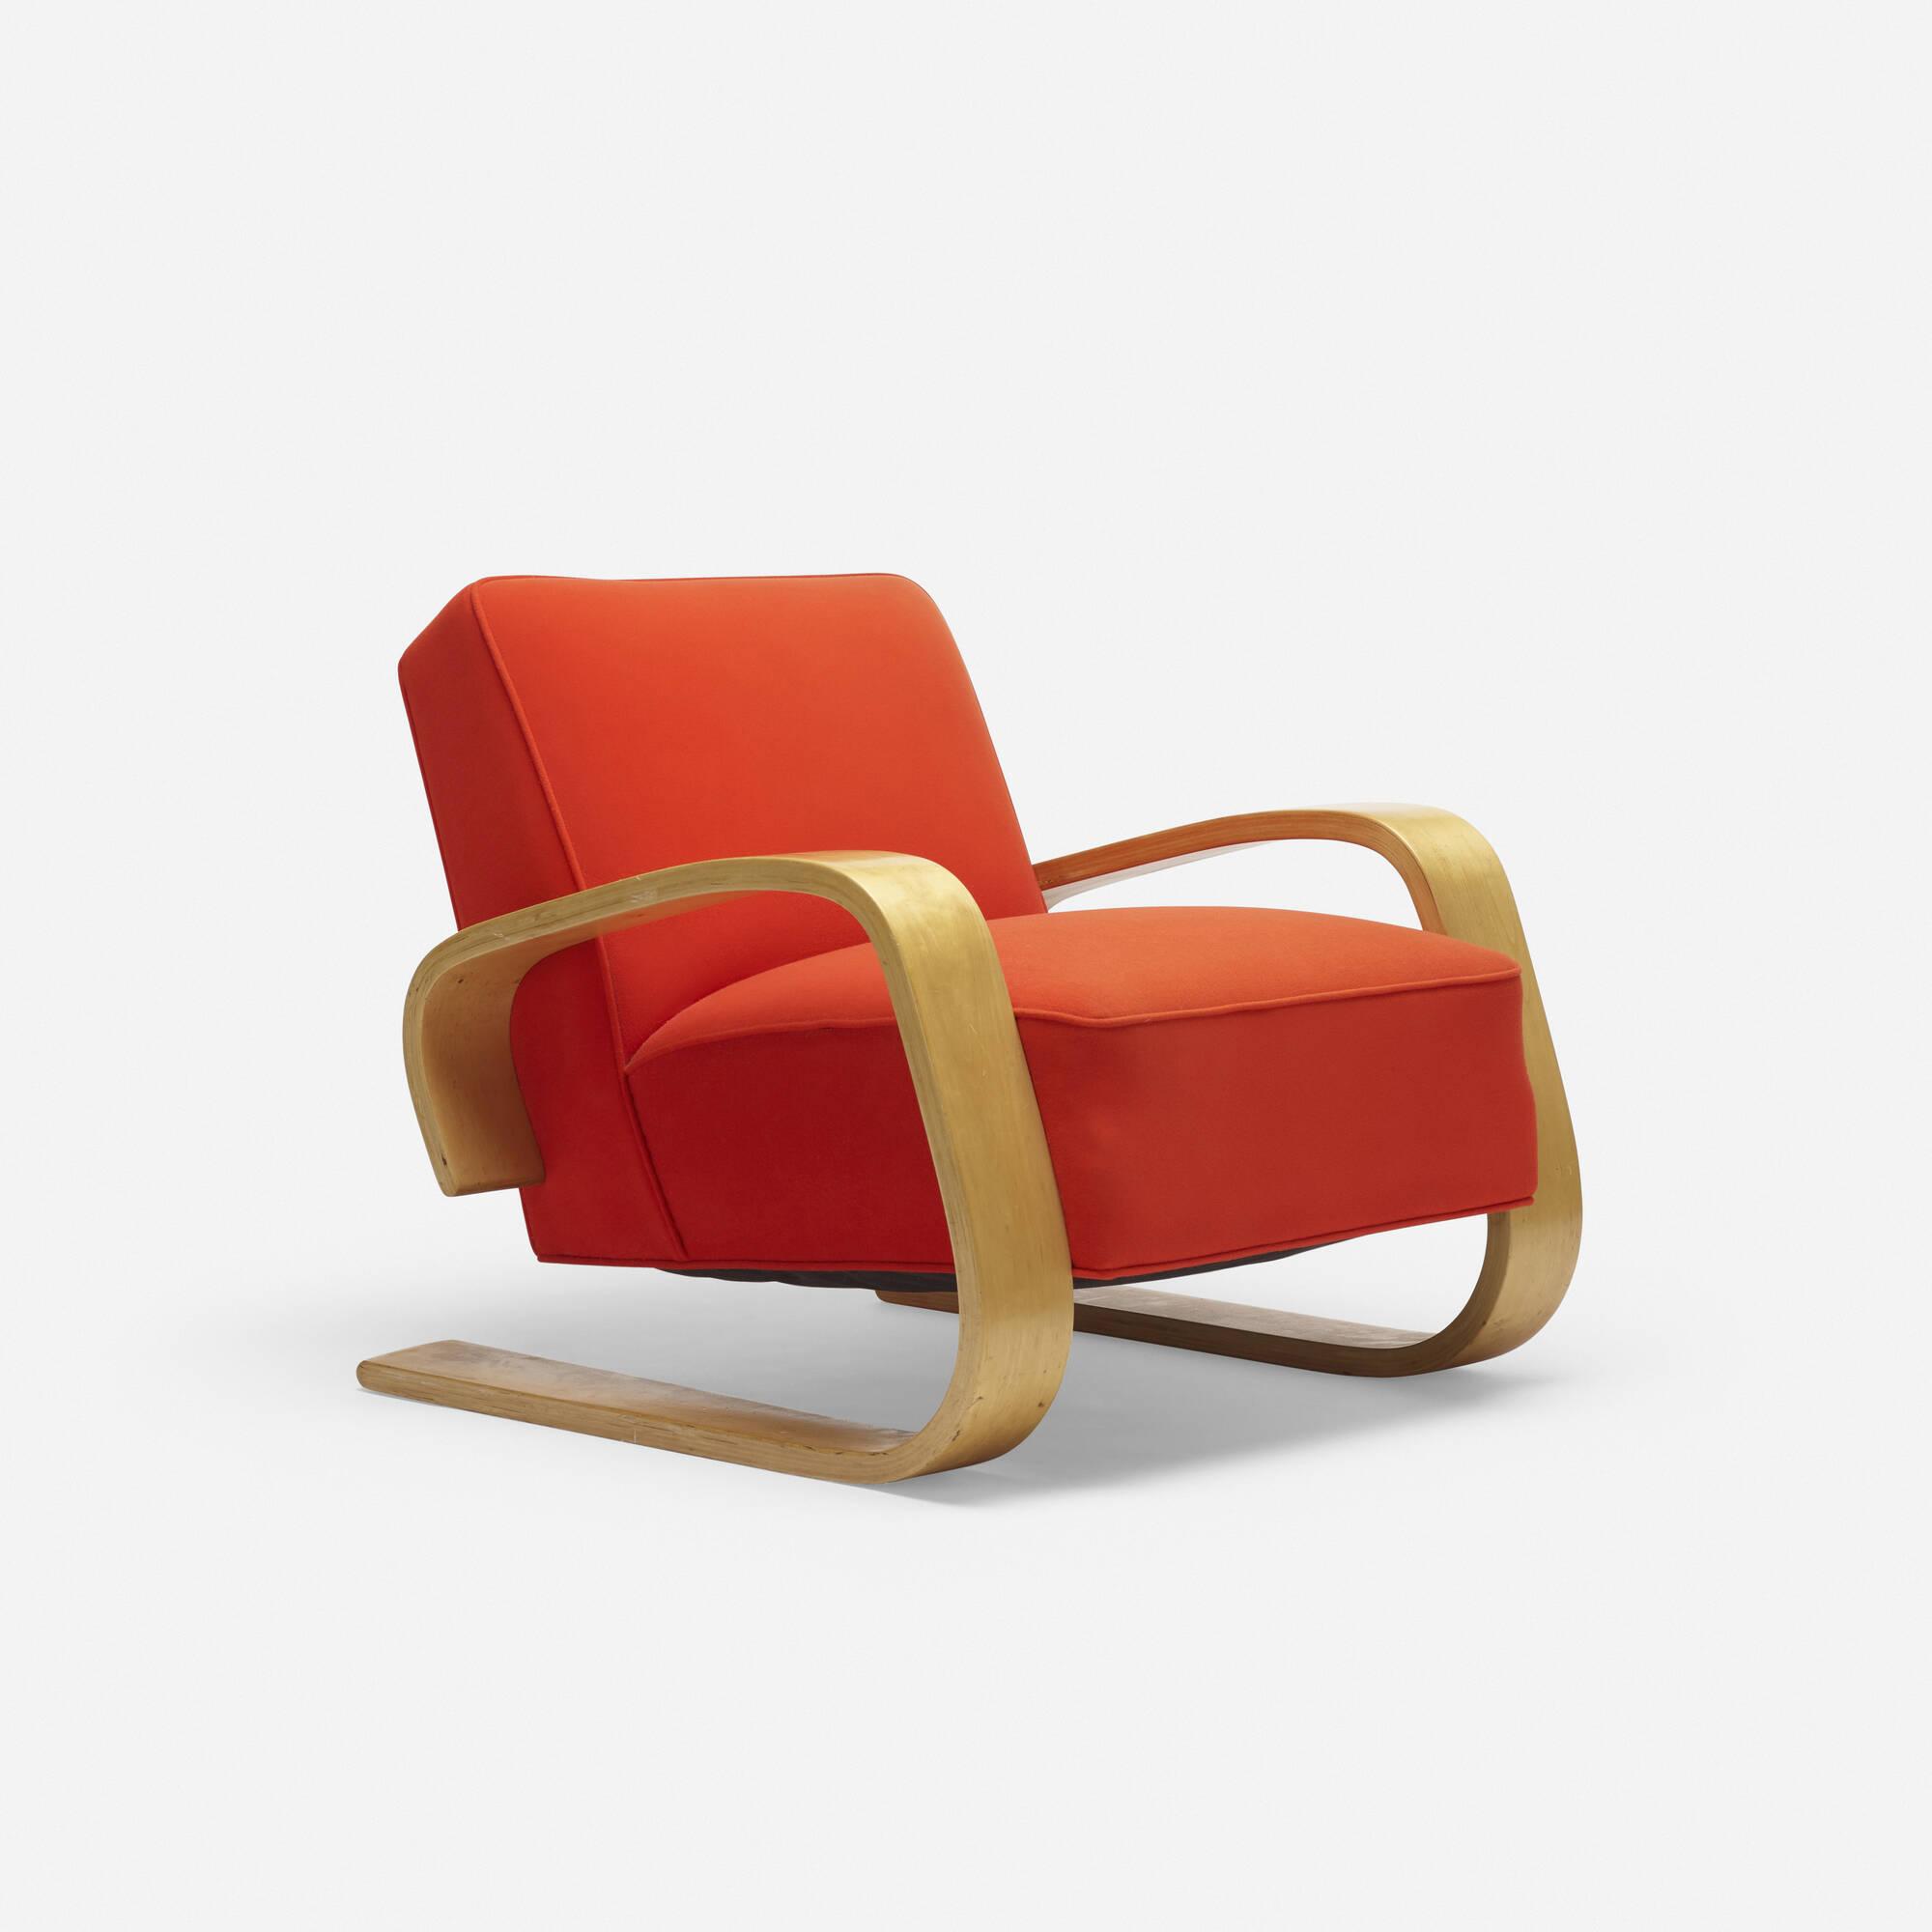 100: Alvar Aalto / Tank lounge chair, model 37/400 (1 of 3)